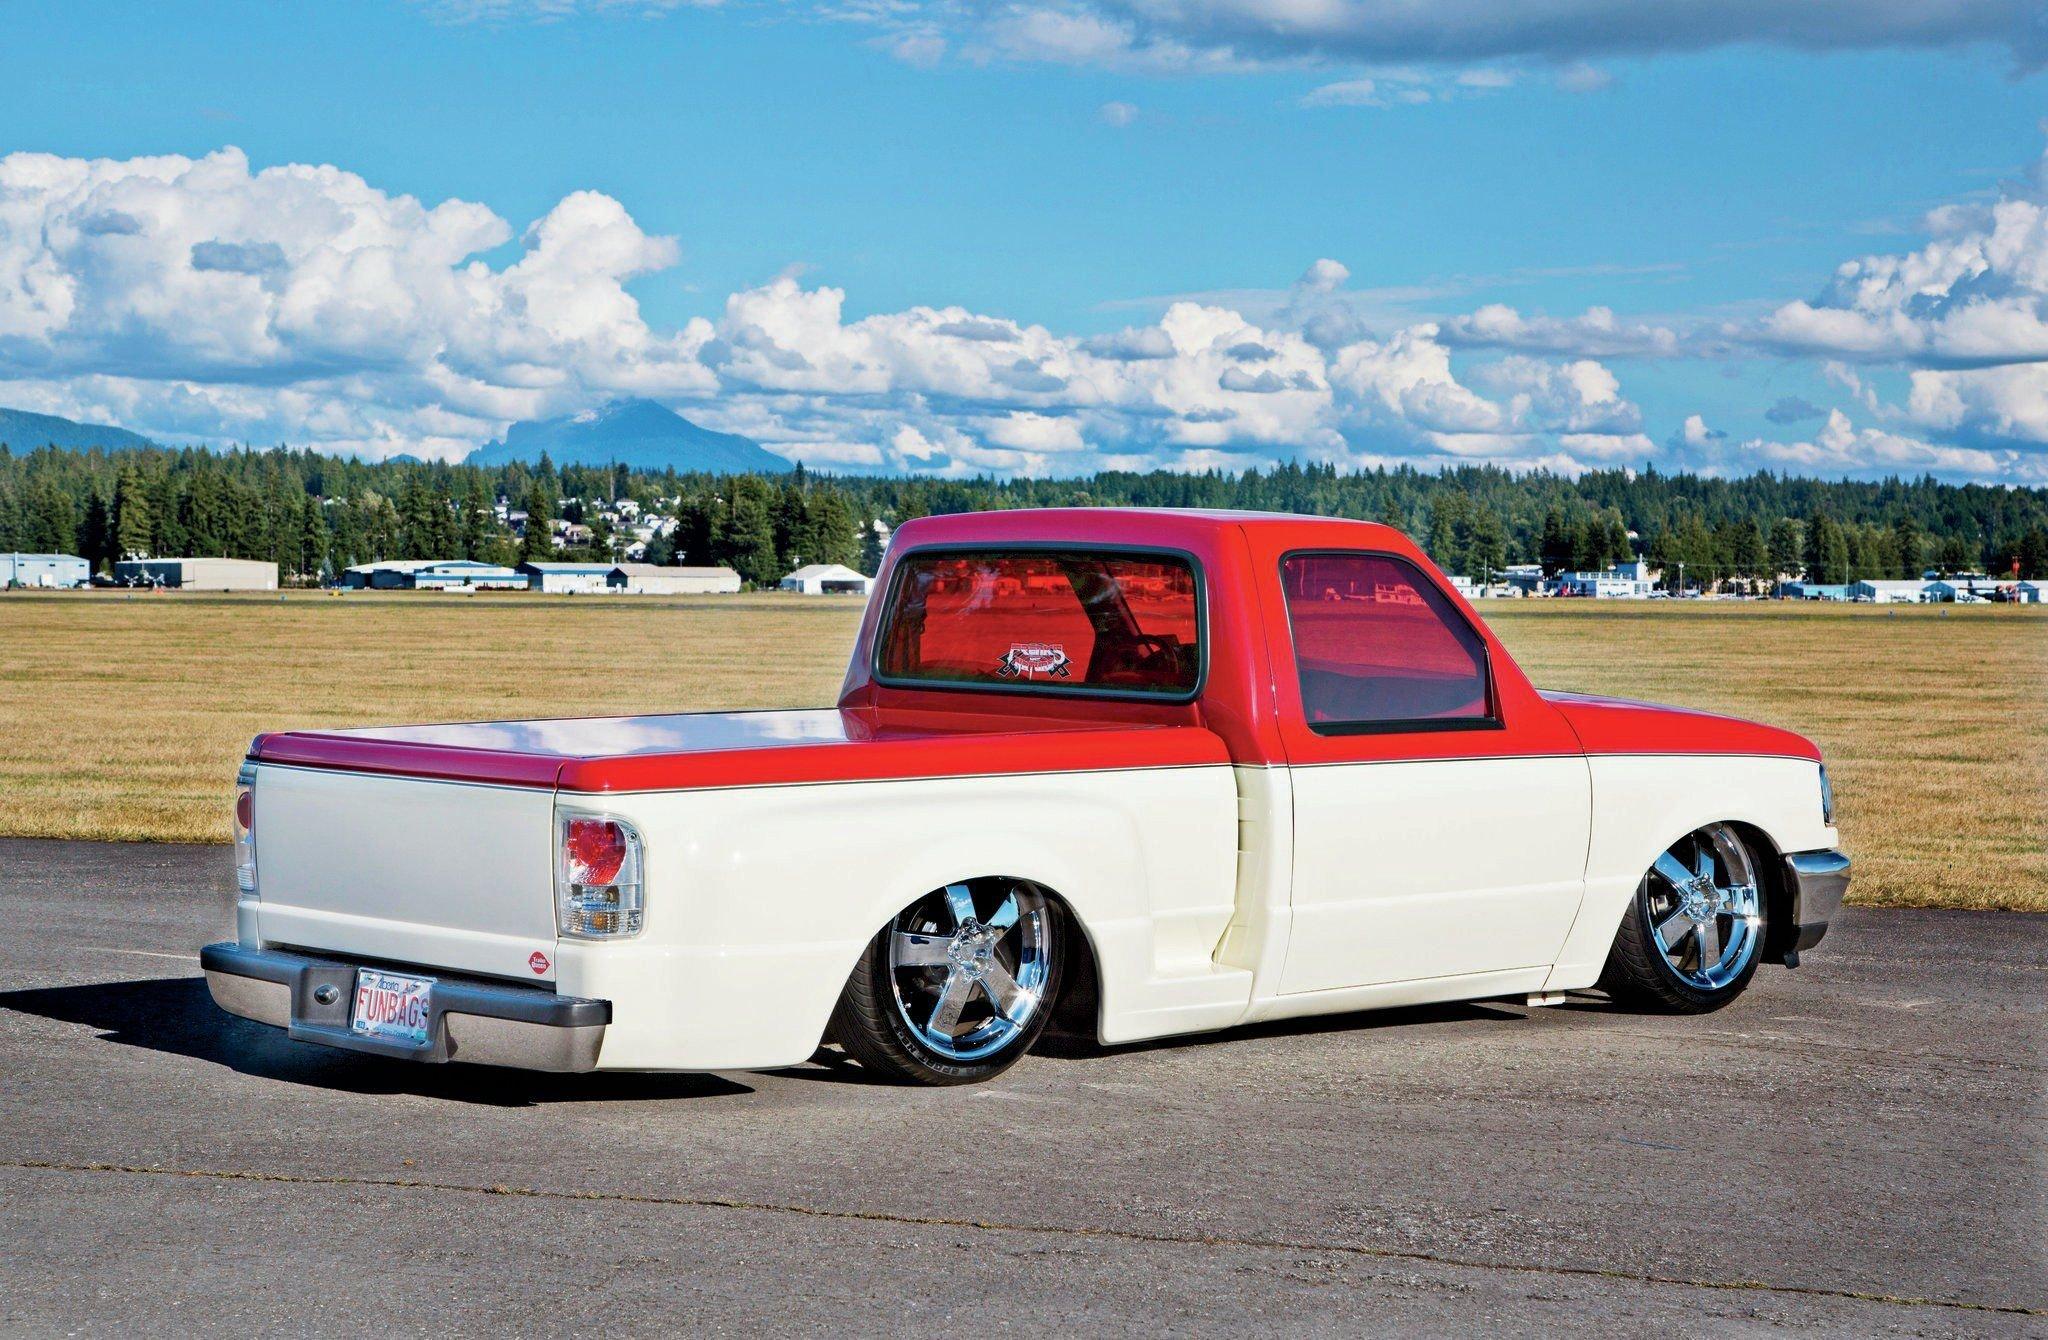 1997 ford ranger pickup lowrider custom tuning wallpaper 2048x1340 880284 wallpaperup. Black Bedroom Furniture Sets. Home Design Ideas